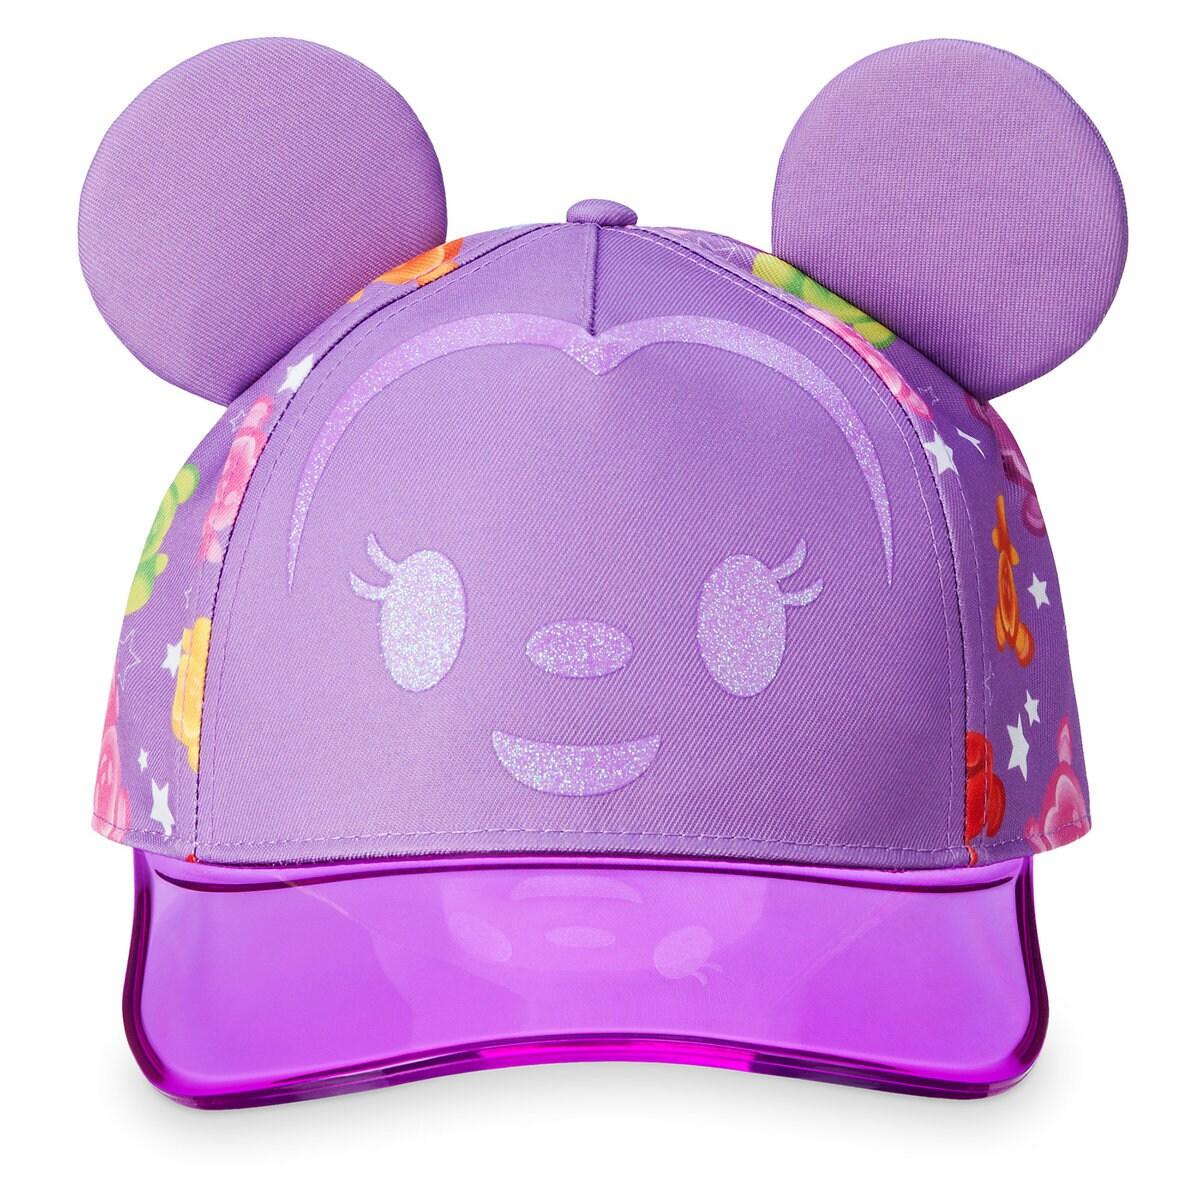 56e722e5e Minnie Mouse Ears Baseball Cap for Girls